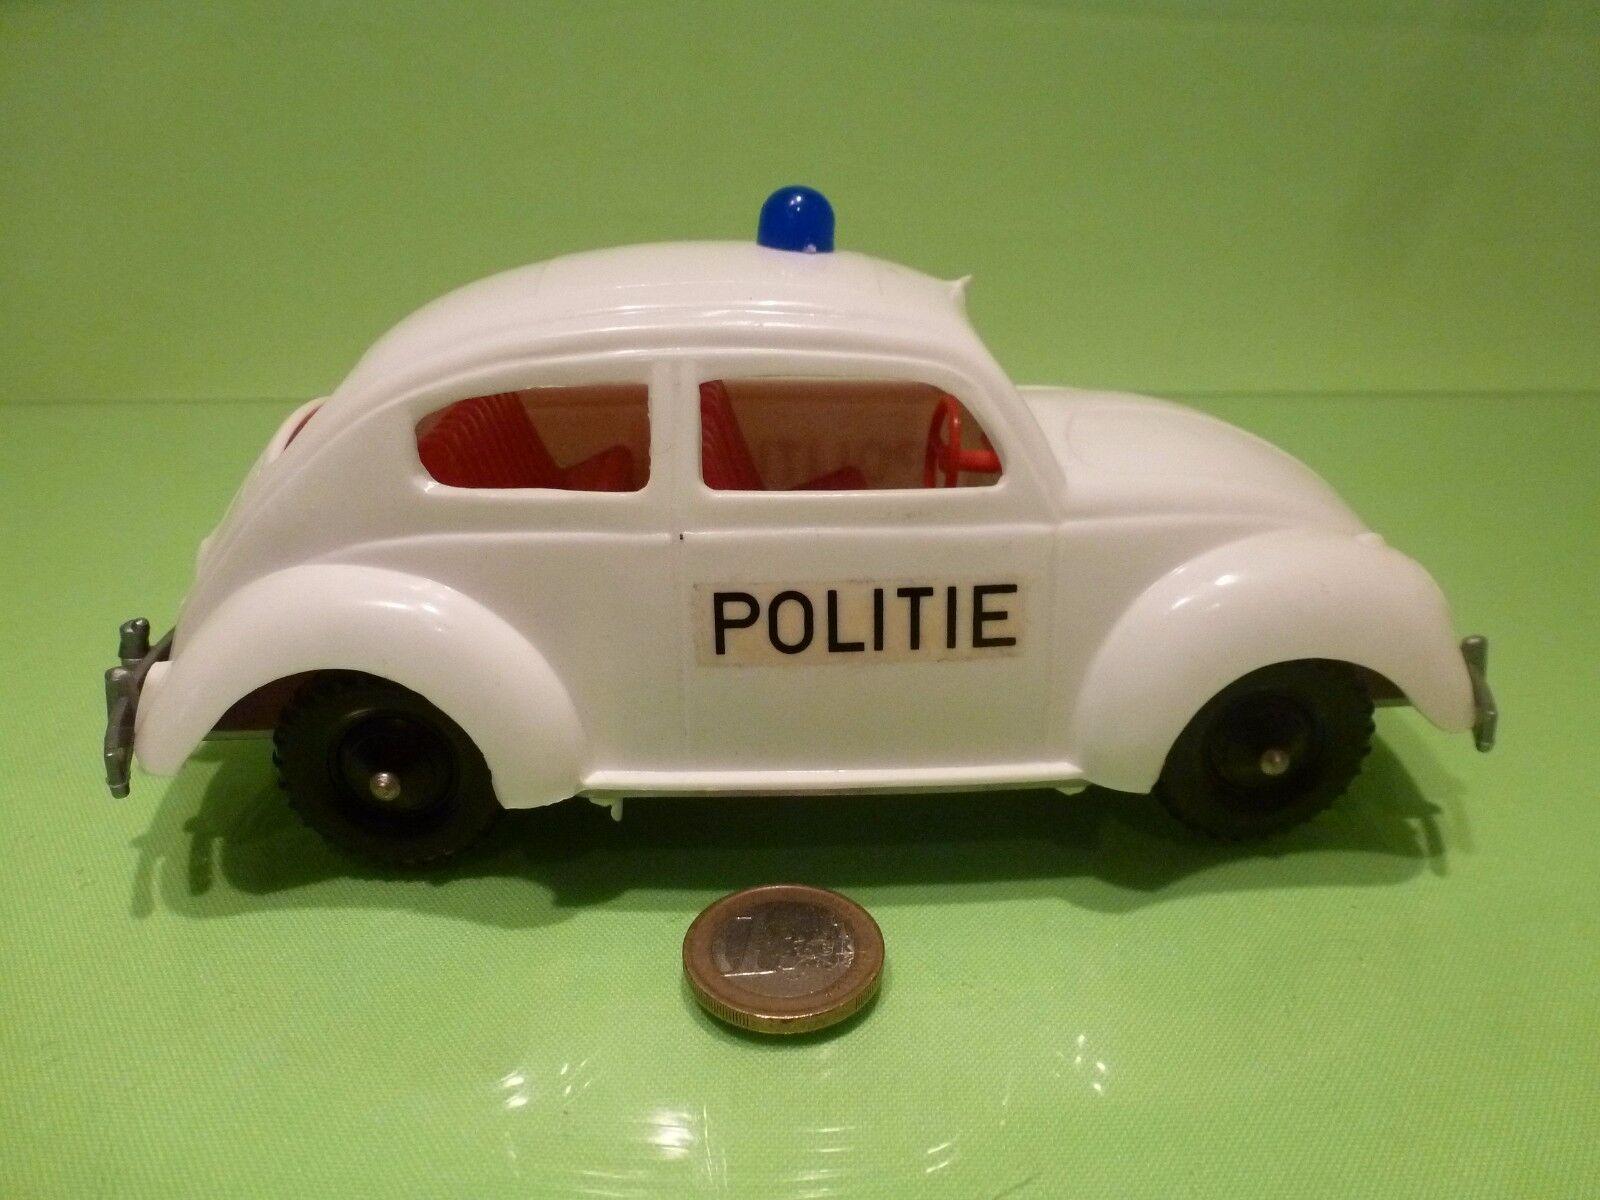 PLASTIC VINTAGE USA USA USA GERMANY VW VOLKSWAGEN BEETLE - POLICE POLITIE - L19.5cm RARE f4834e